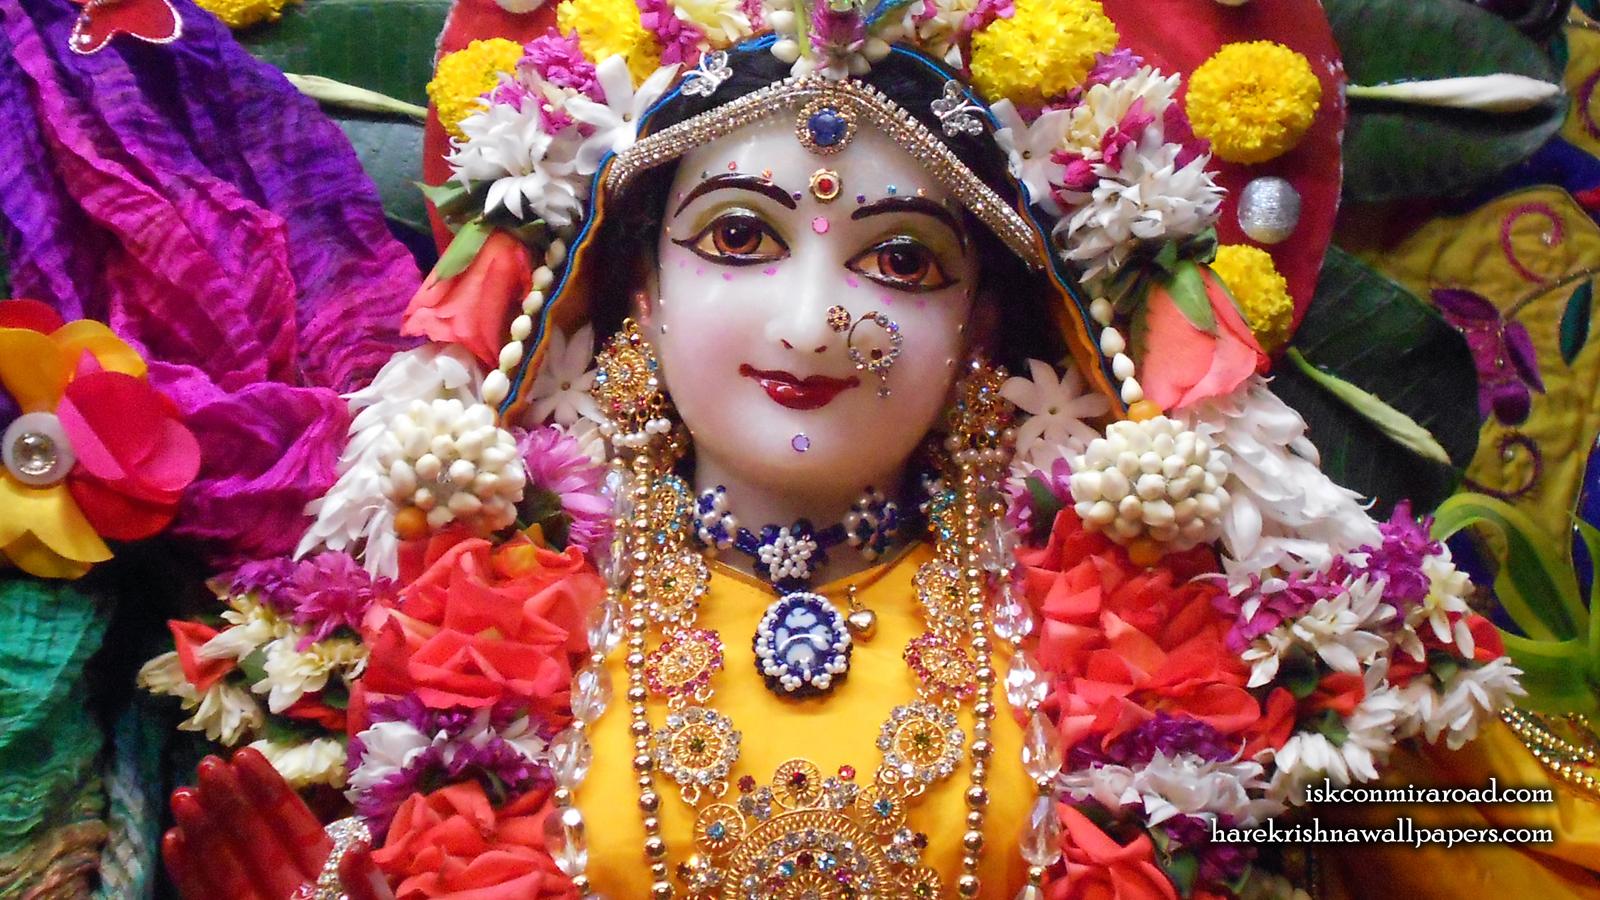 Sri Radha Close up Wallpaper (011) Size 1600x900 Download